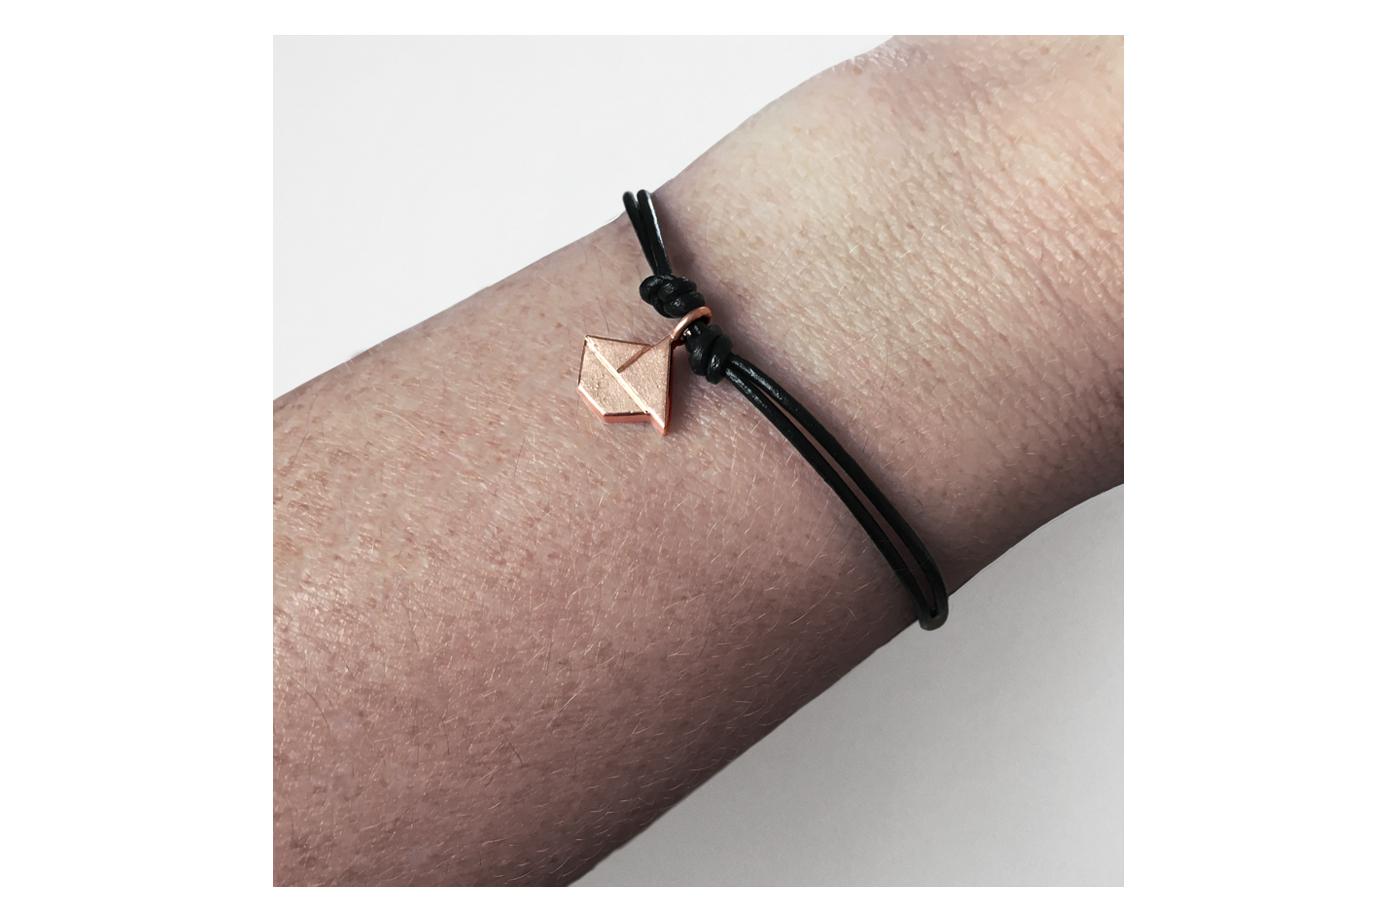 SCHIFFCHEN - Tangram Kette oder Armband, 935 Silber, auf Wunsch vergoldet - 4